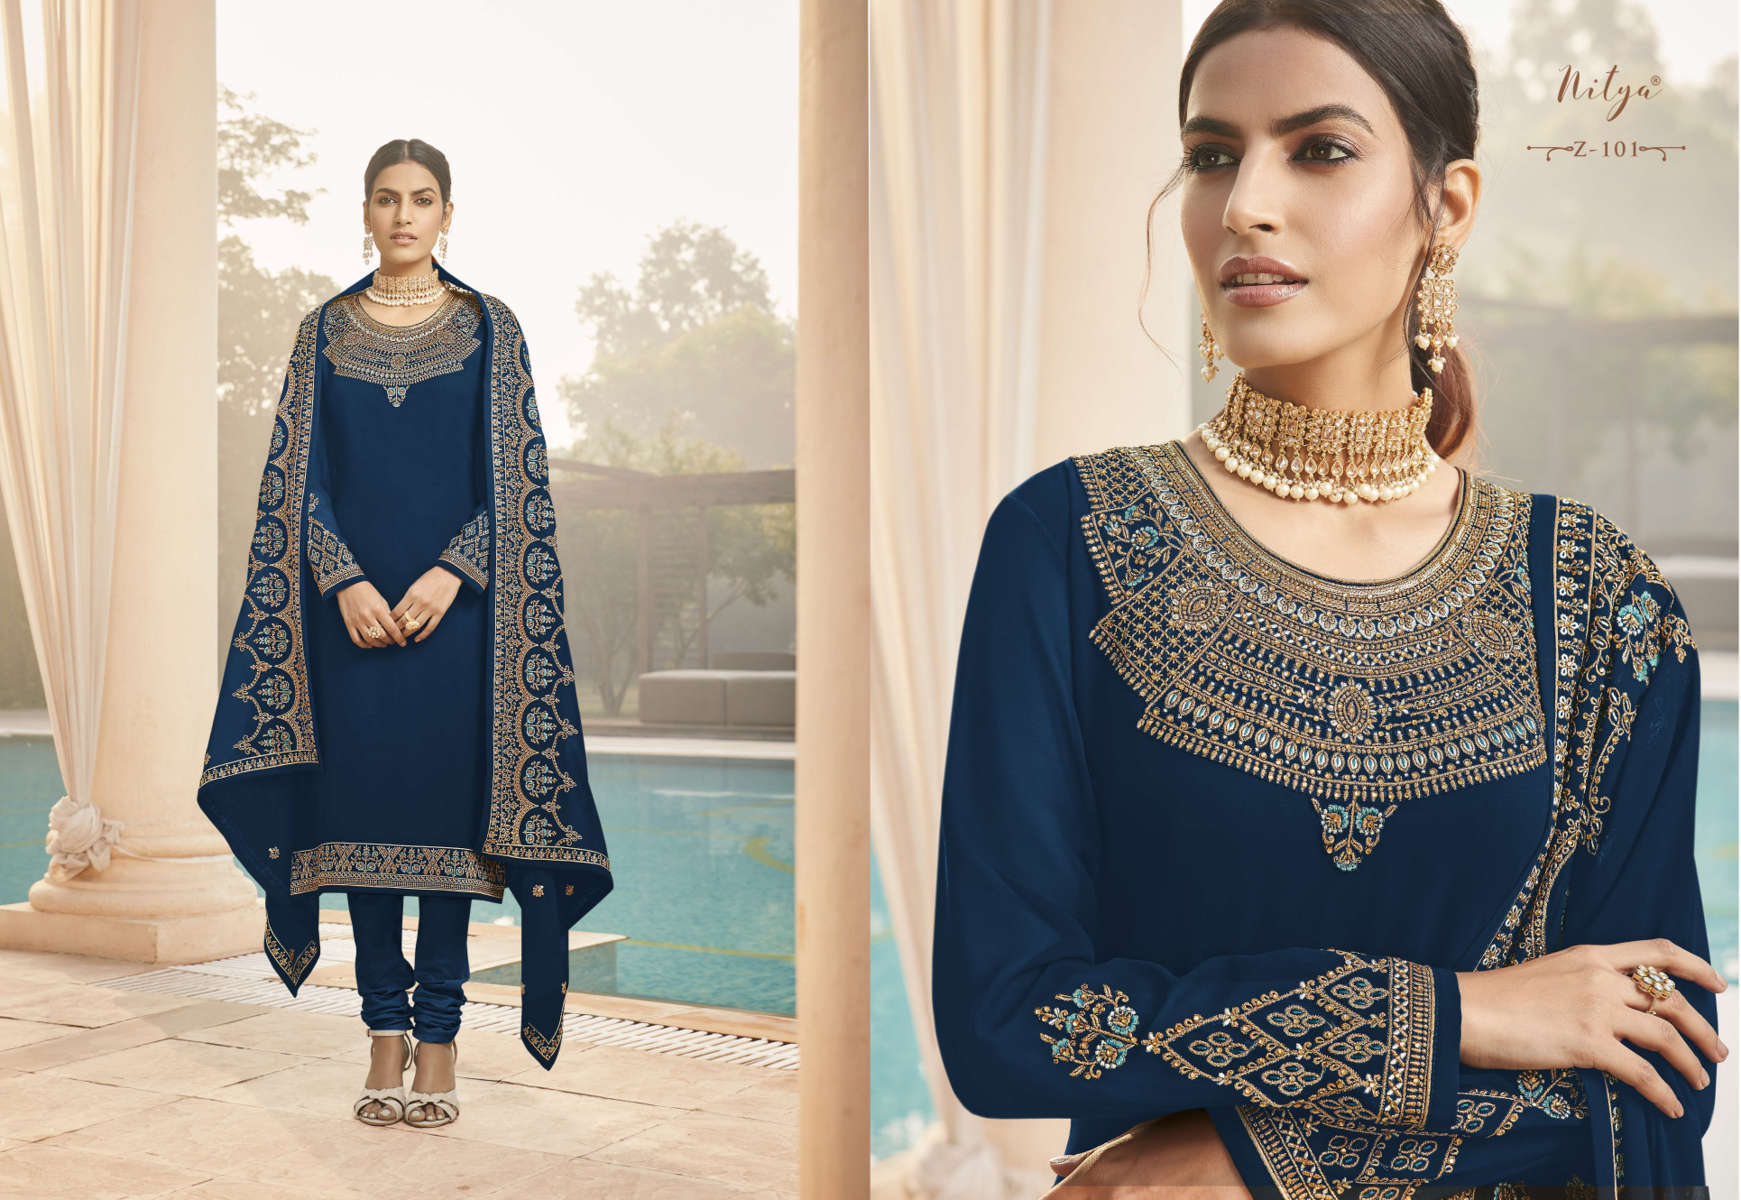 Lt Fabrics Nitya Zyrah Salwar Suit Wholesale Catalog 5 Pcs 2 1 - Lt Fabrics Nitya Zyrah Salwar Suit Wholesale Catalog 5 Pcs